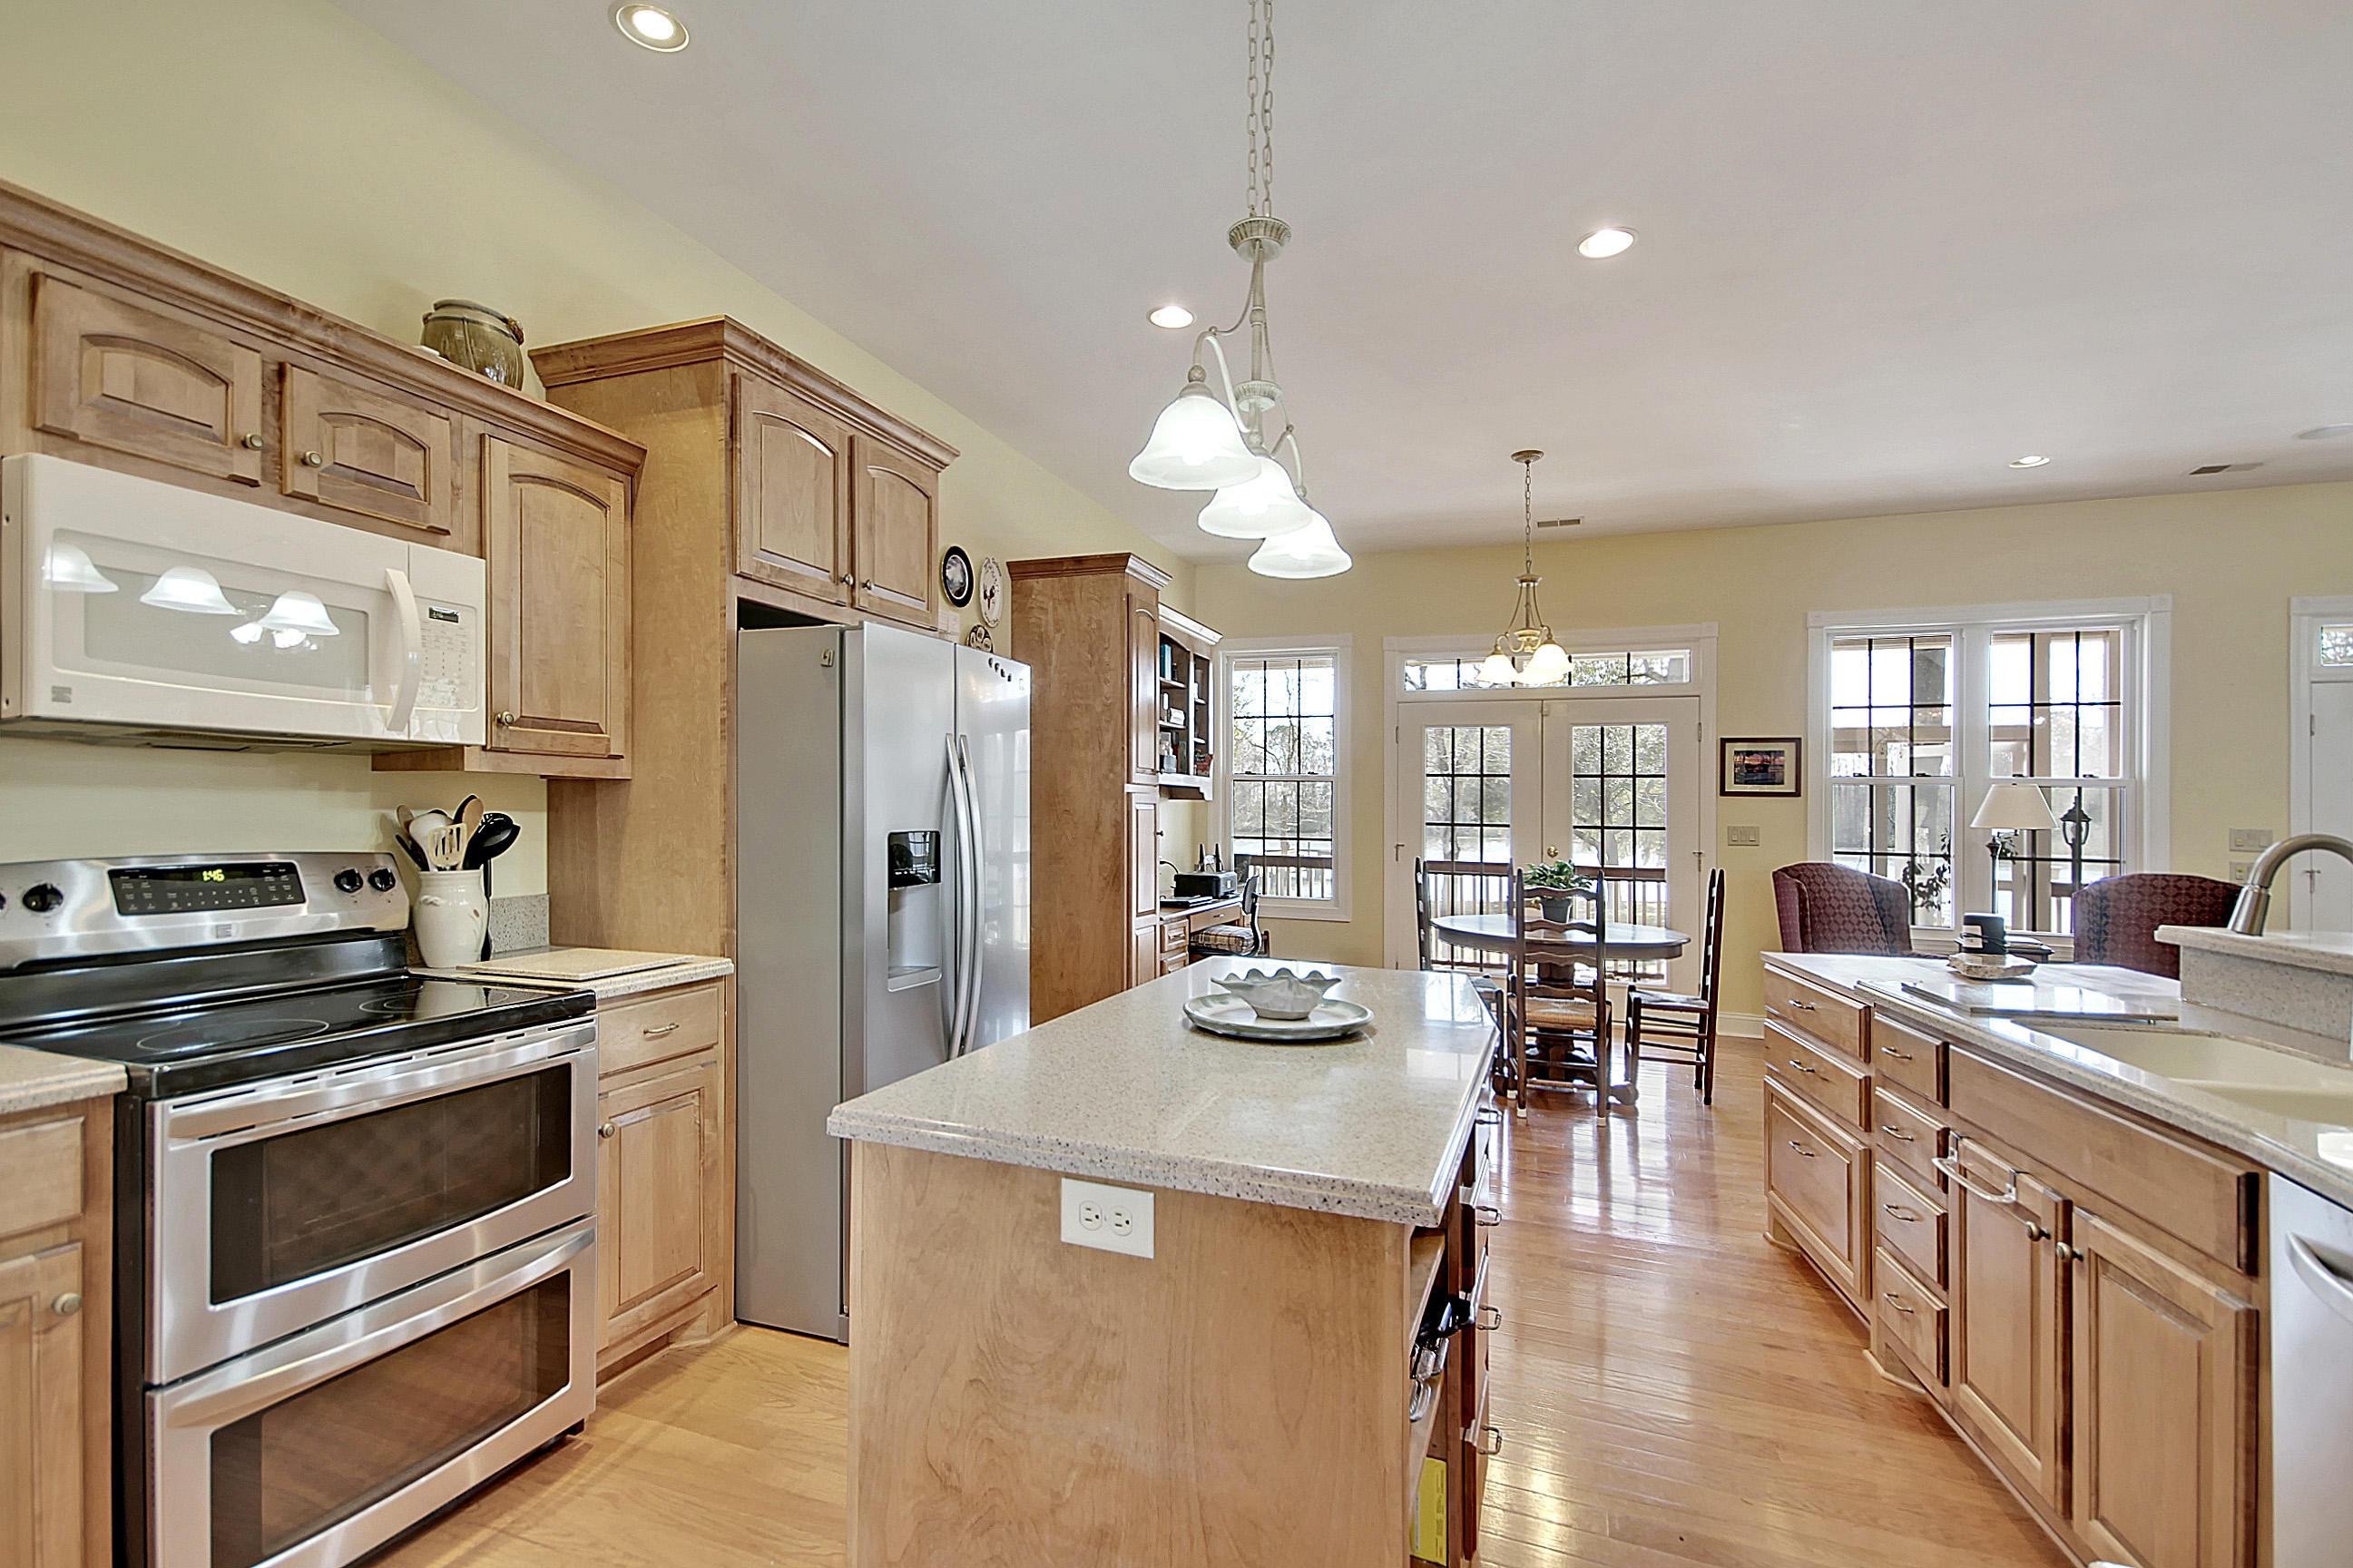 Cross Subd (Longpoint) Homes For Sale - 1191 Longpoint, Cross, SC - 33